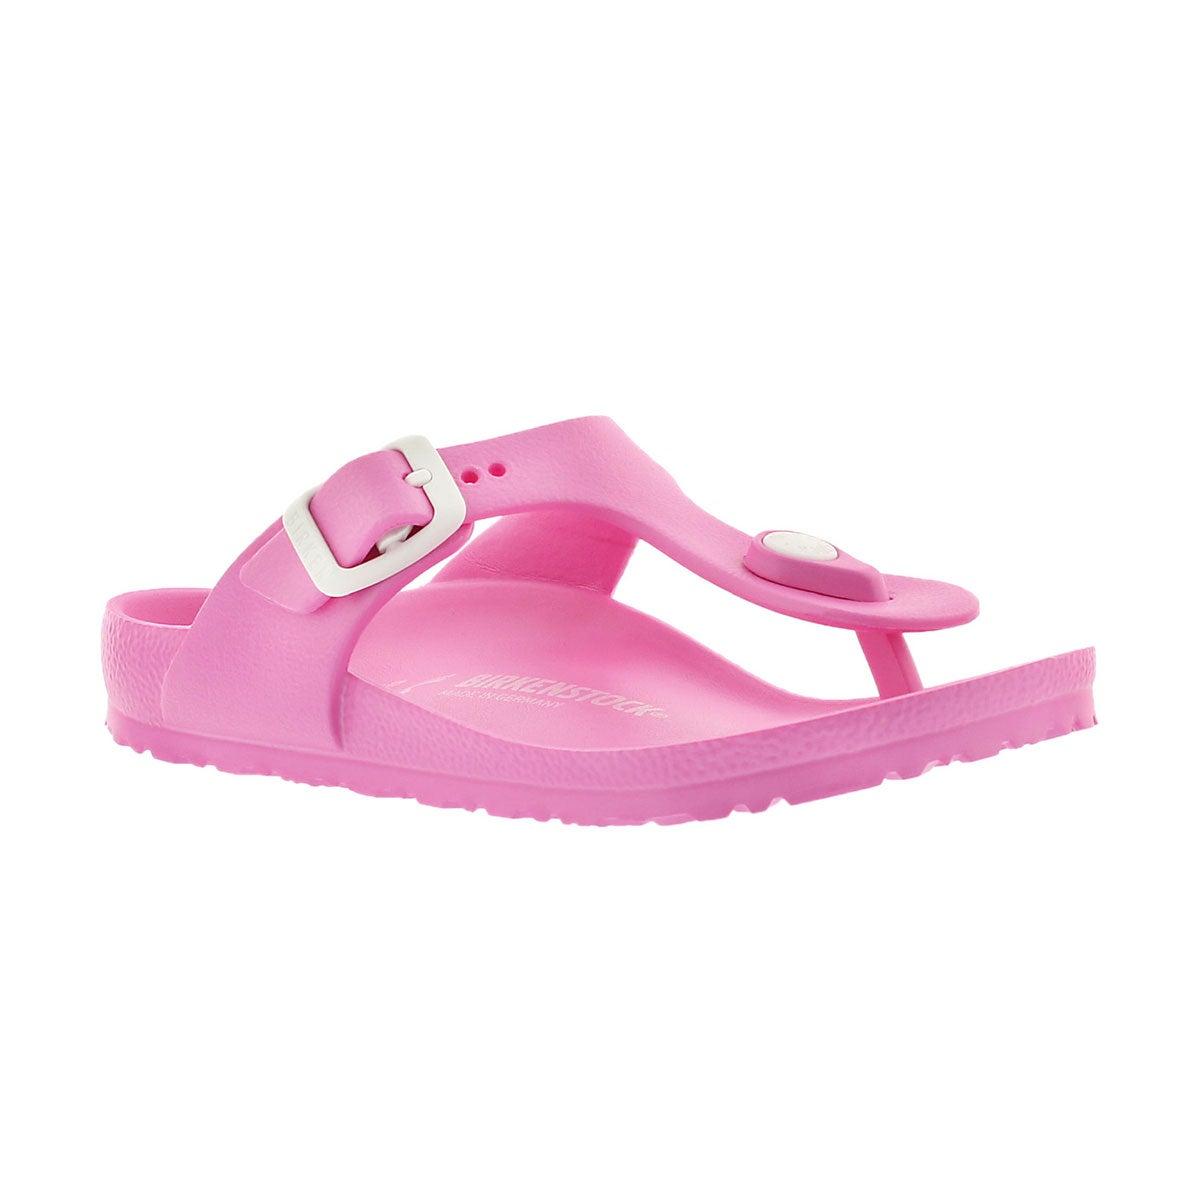 Girls' GIZEH EVA fuchsia thong sandals - Narrow